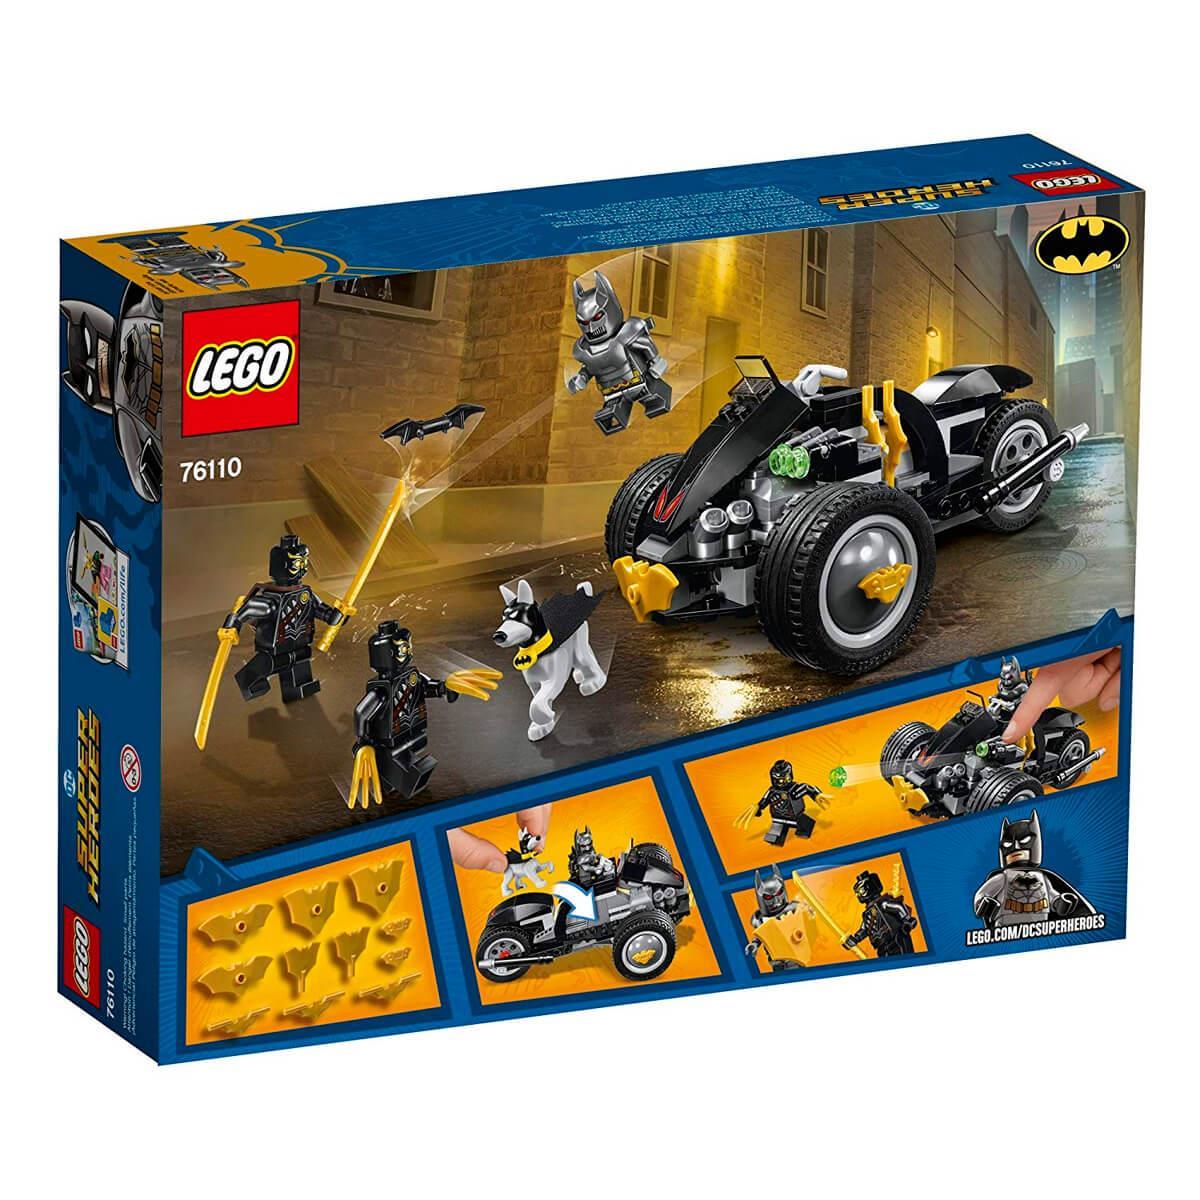 0daec98ef5ab3 LEGO DC Super Heroes - Batman  Ataque dos Garras (76110) - 155 Peças